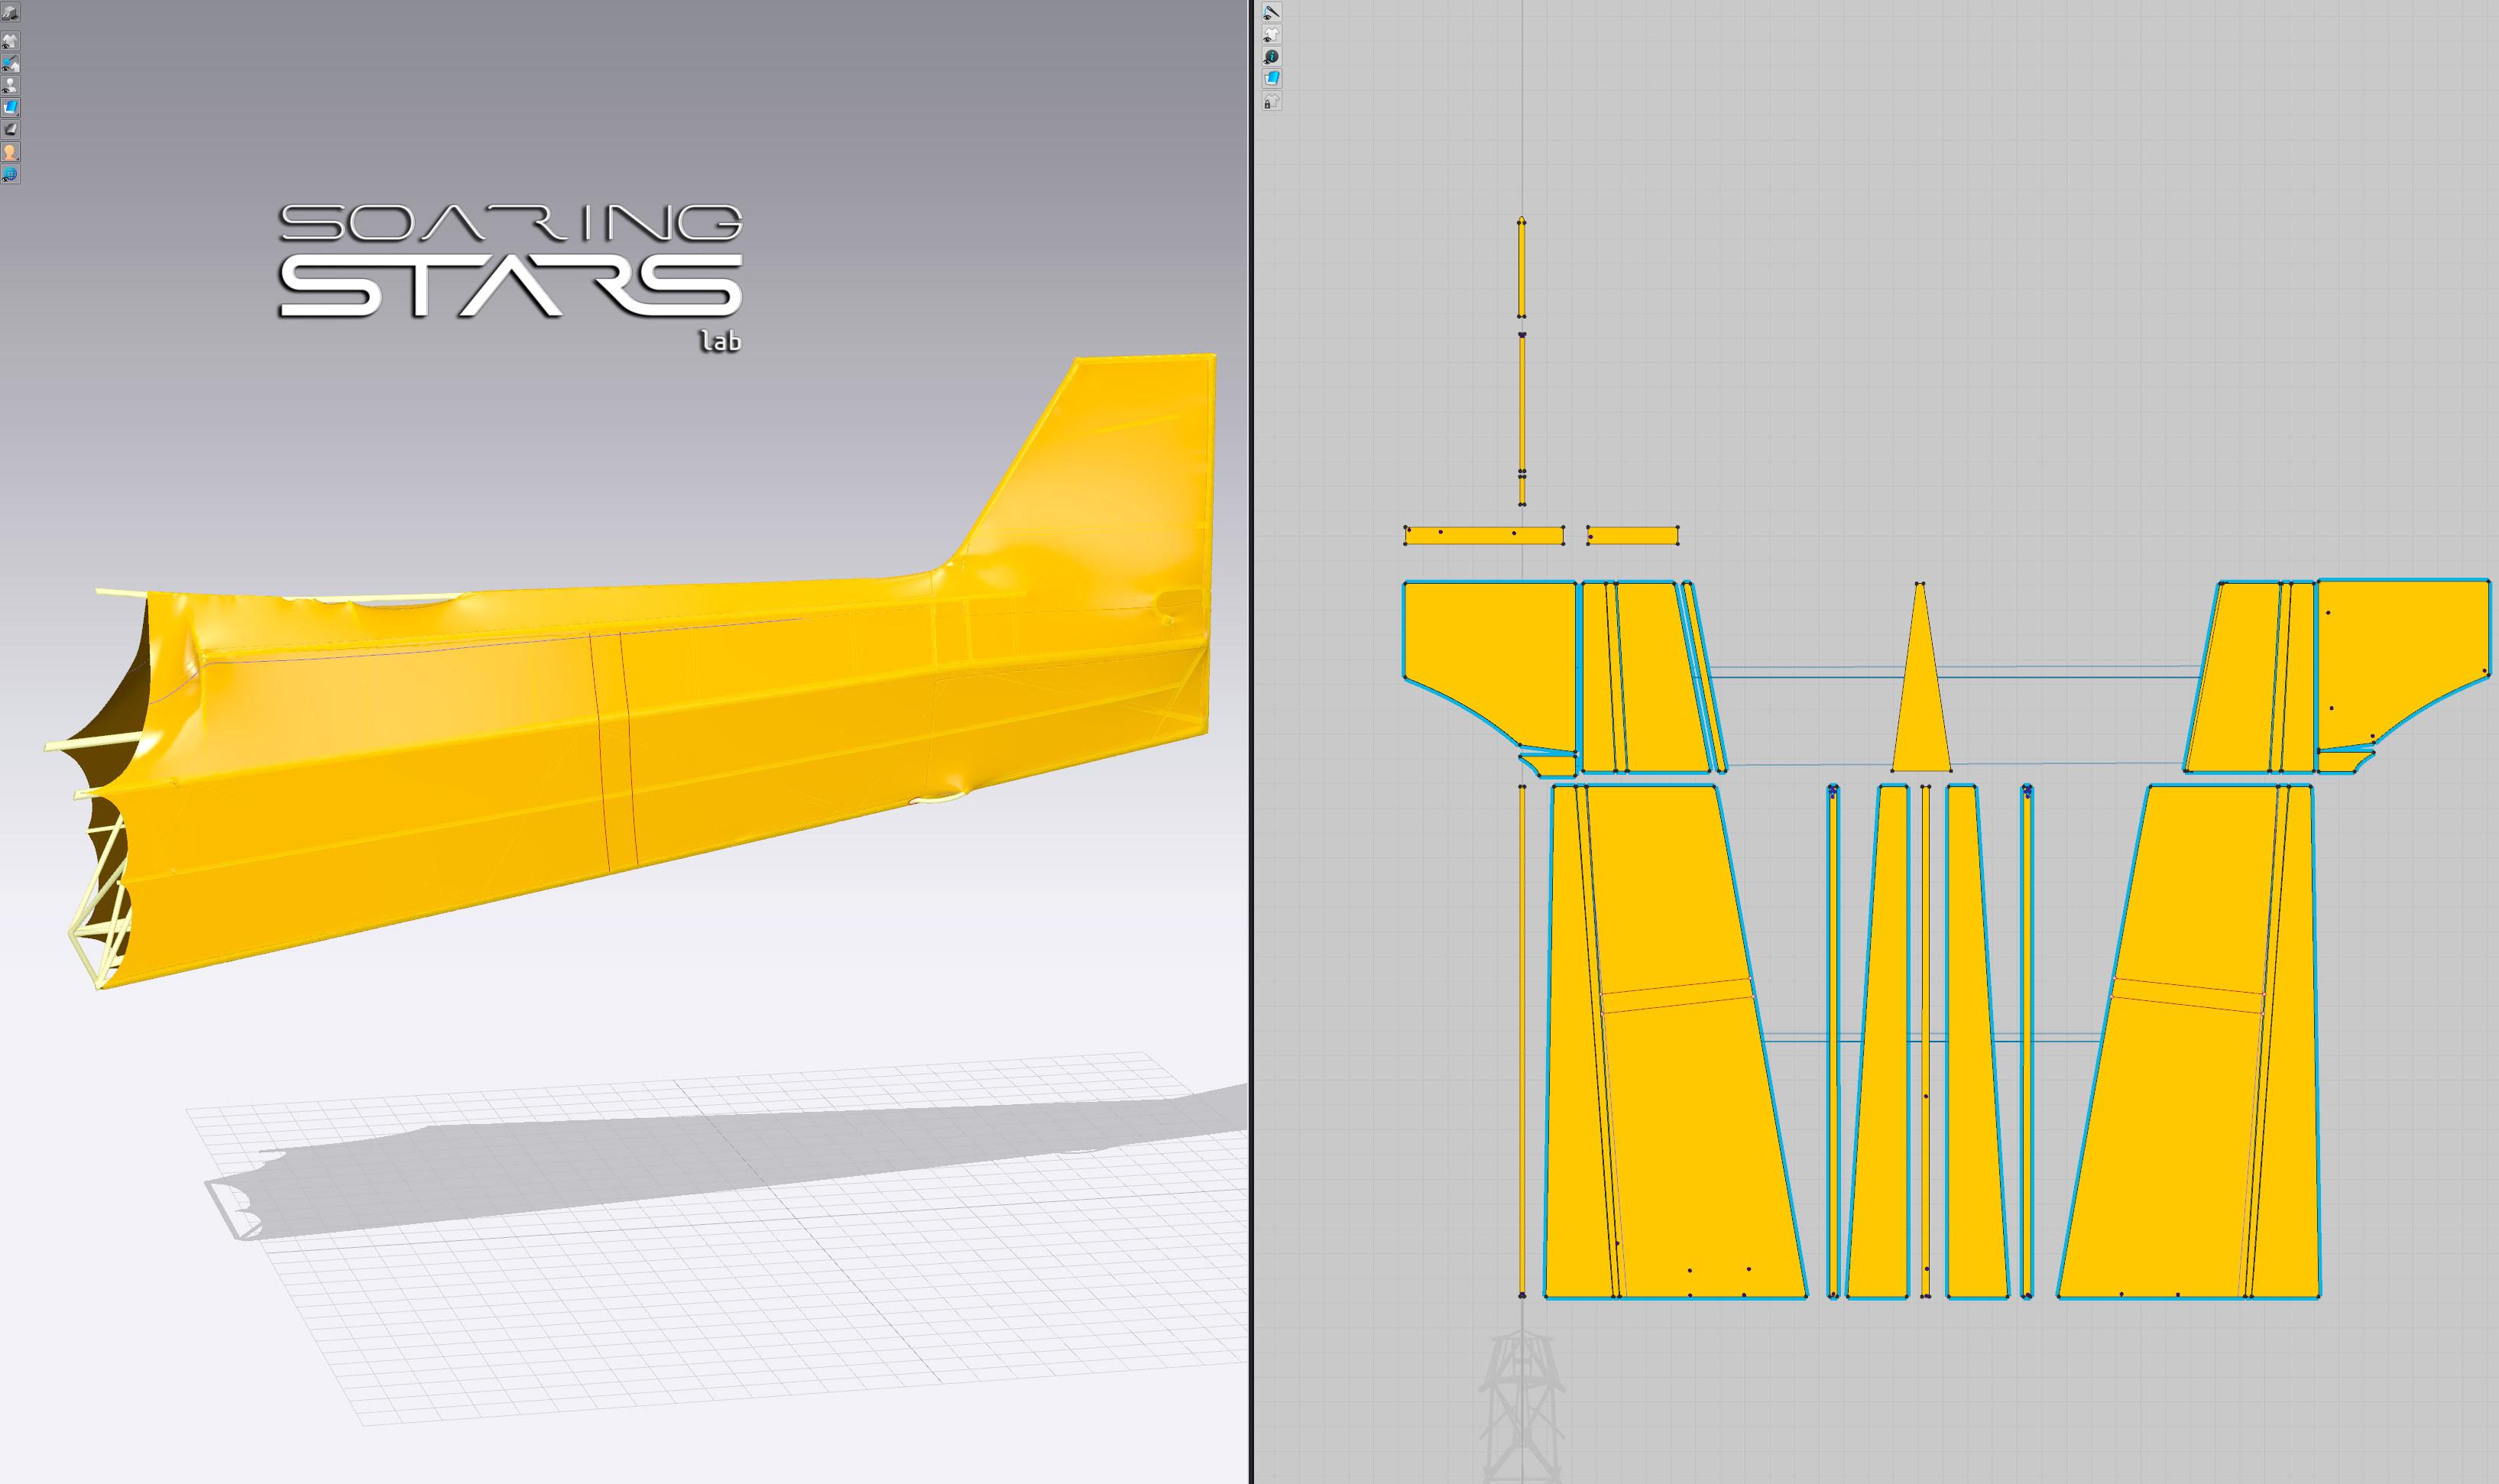 J3 CUB inside Clo3D Virtual Fashion Software